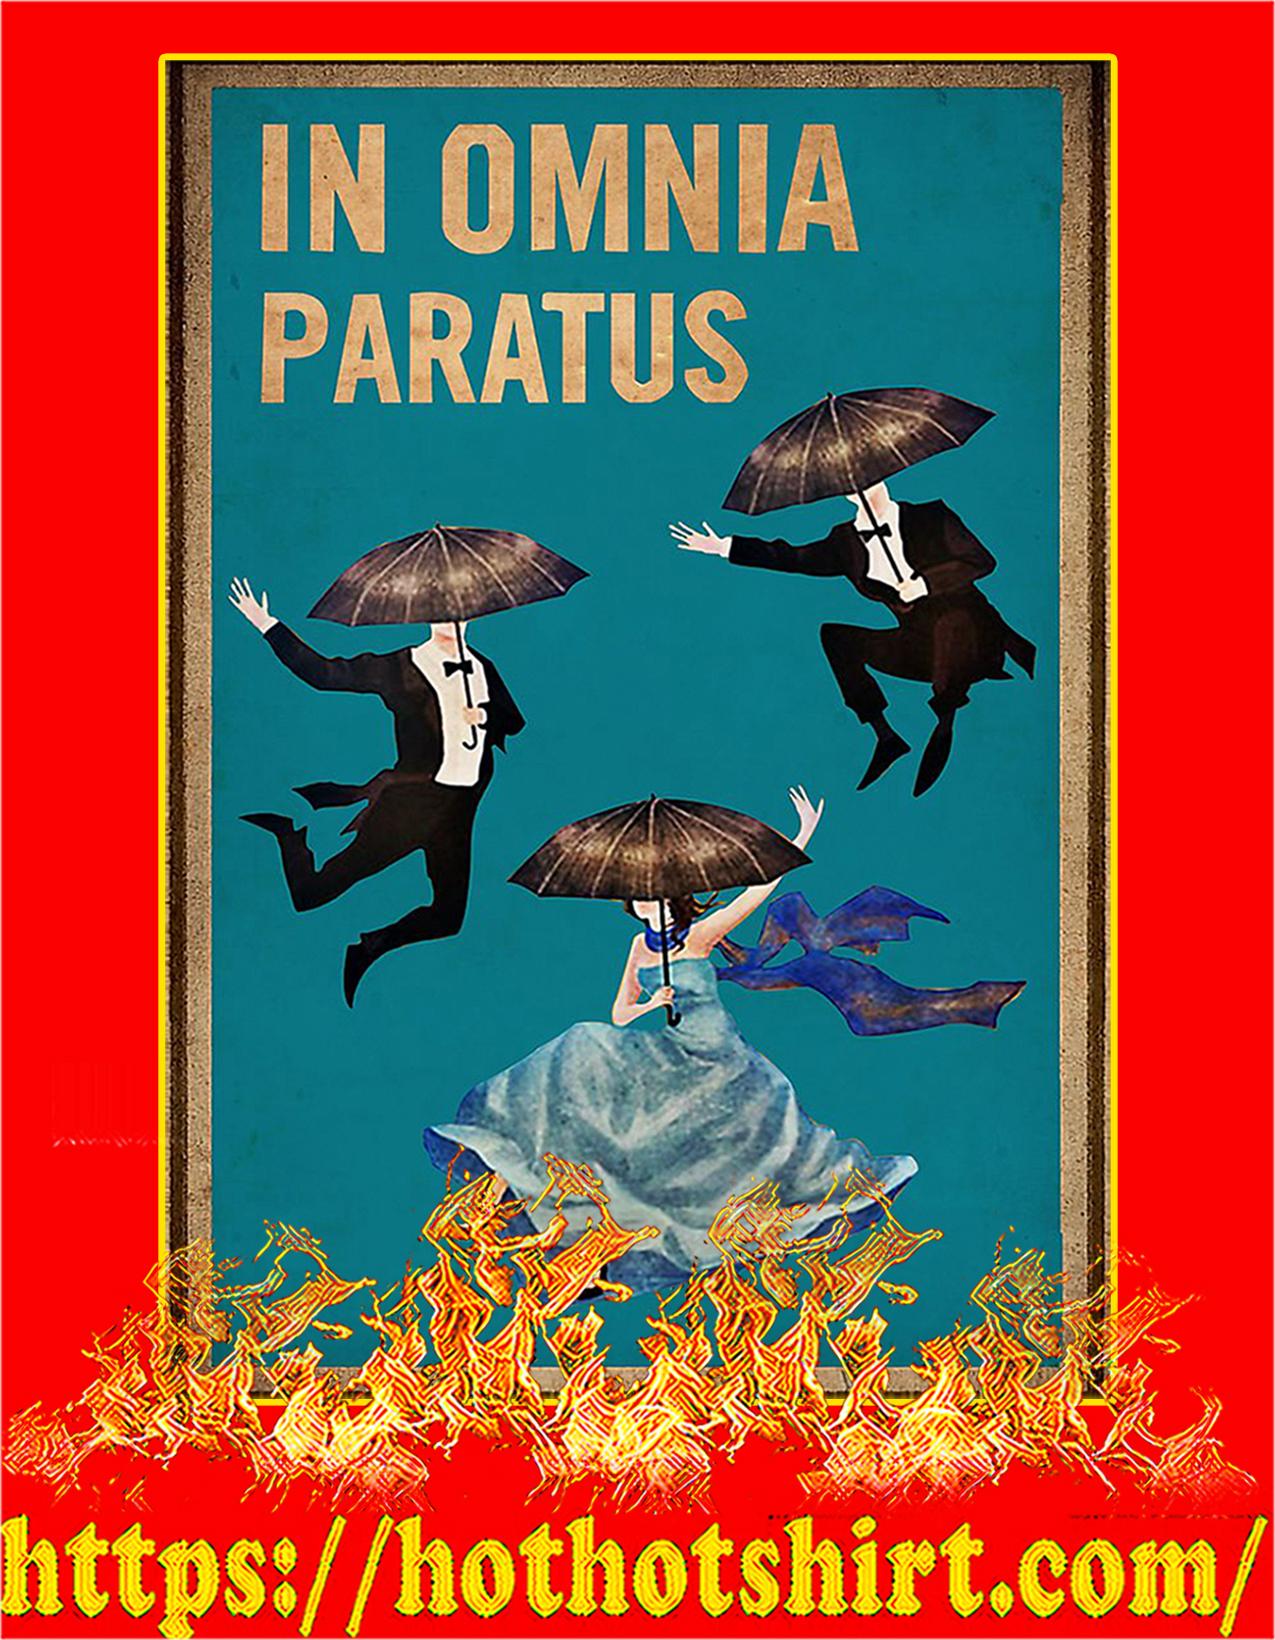 In omnia paratus poster - A2